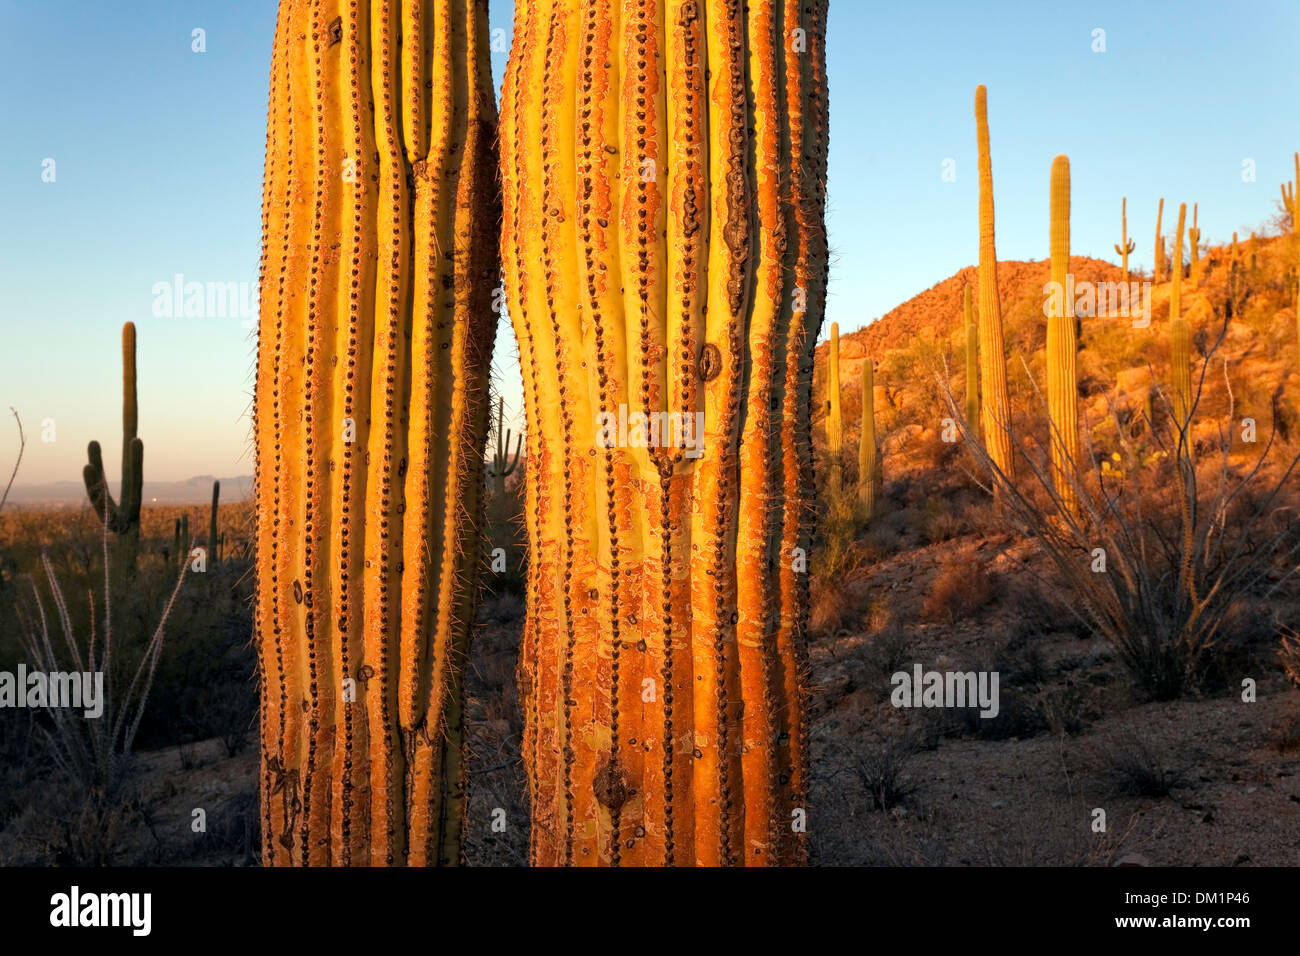 Cactus gigante saguaro (Carnegiea gigantea), el Parque Nacional de Saguaro, West, unidad de Tucson, Arizona. Imagen De Stock